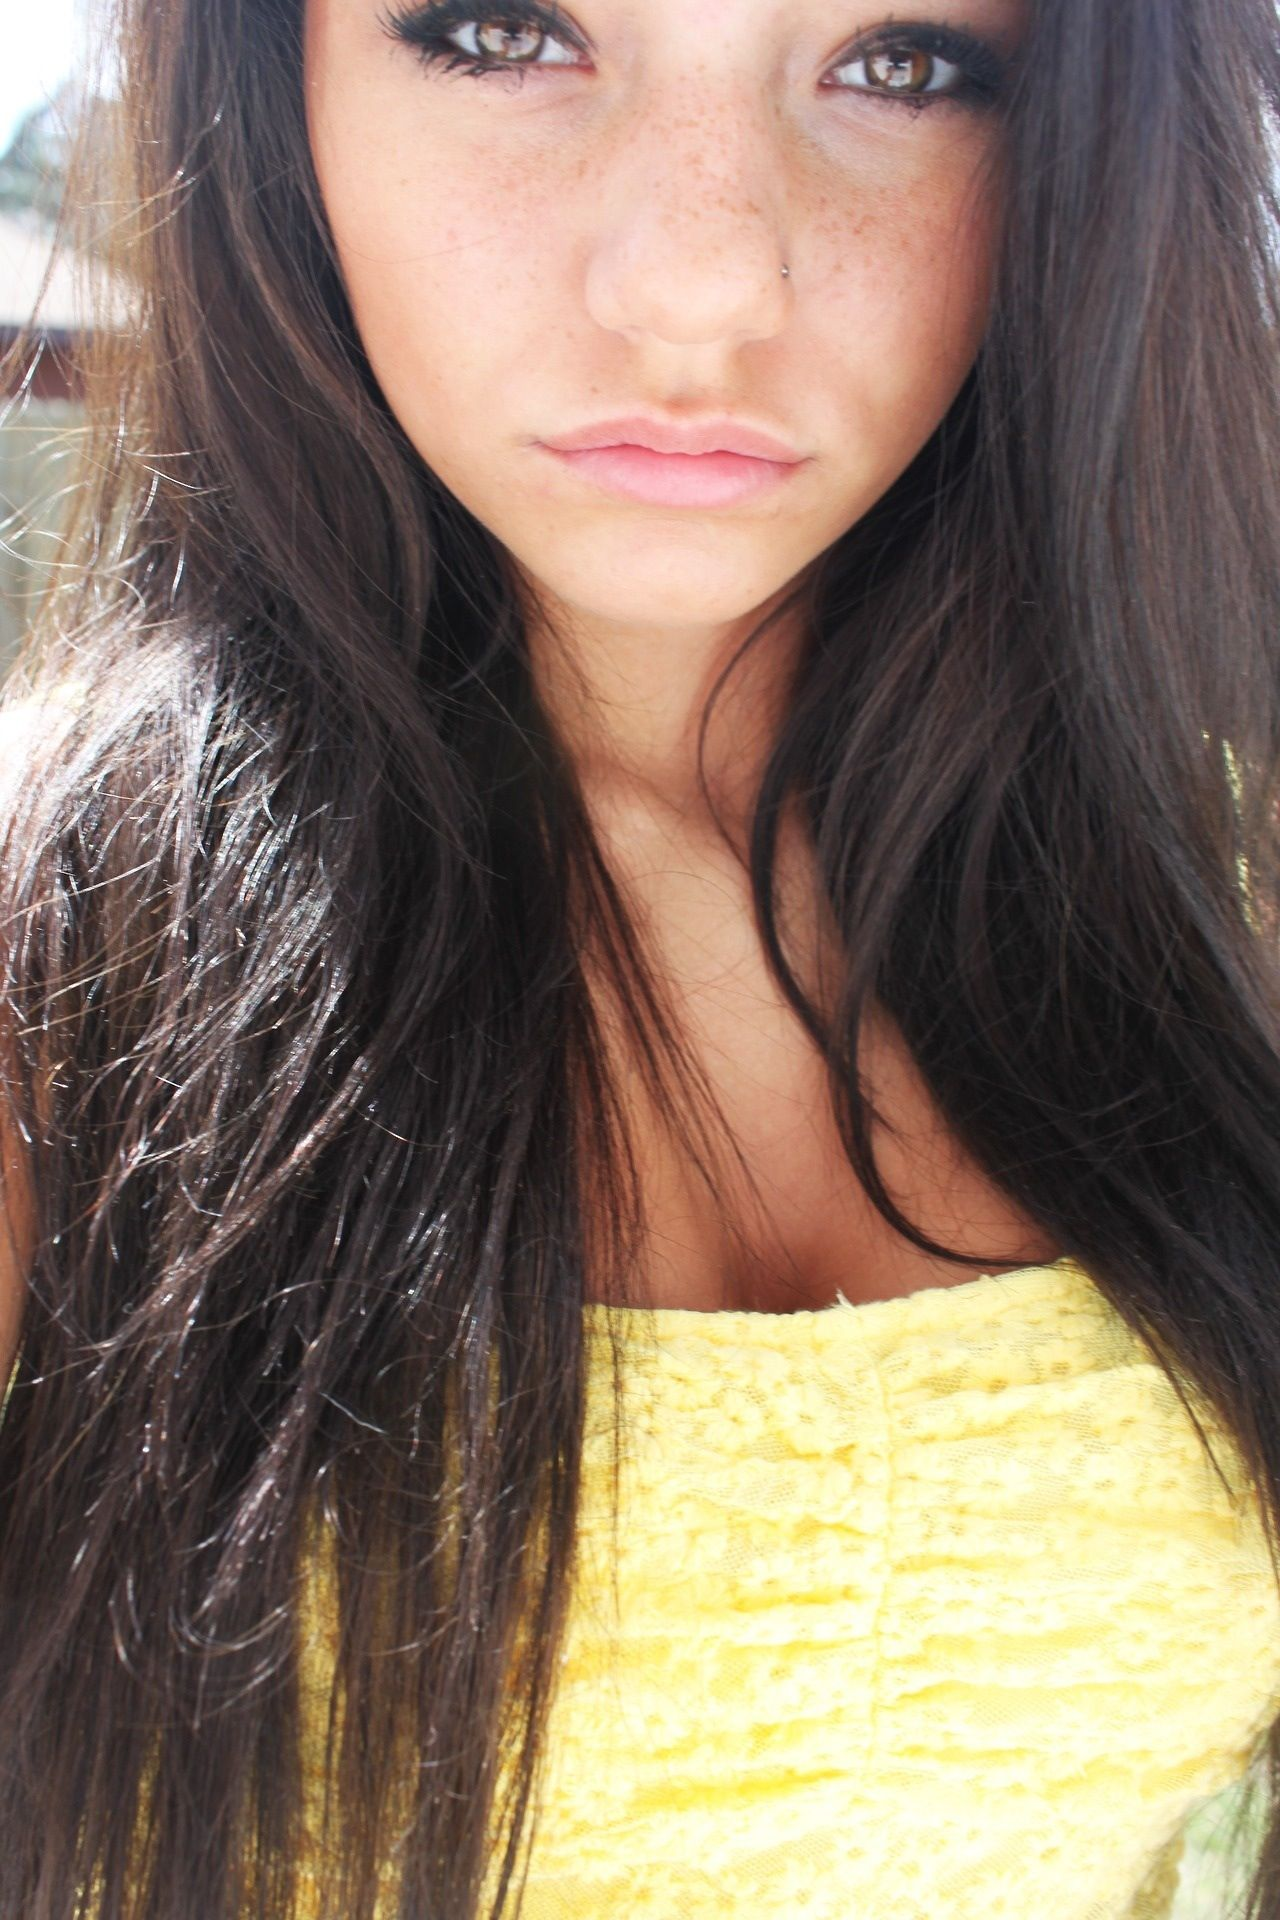 Megan NiHart ~ Nose Stud Piercing | Megan Nihart | Pinterest | Nose ...